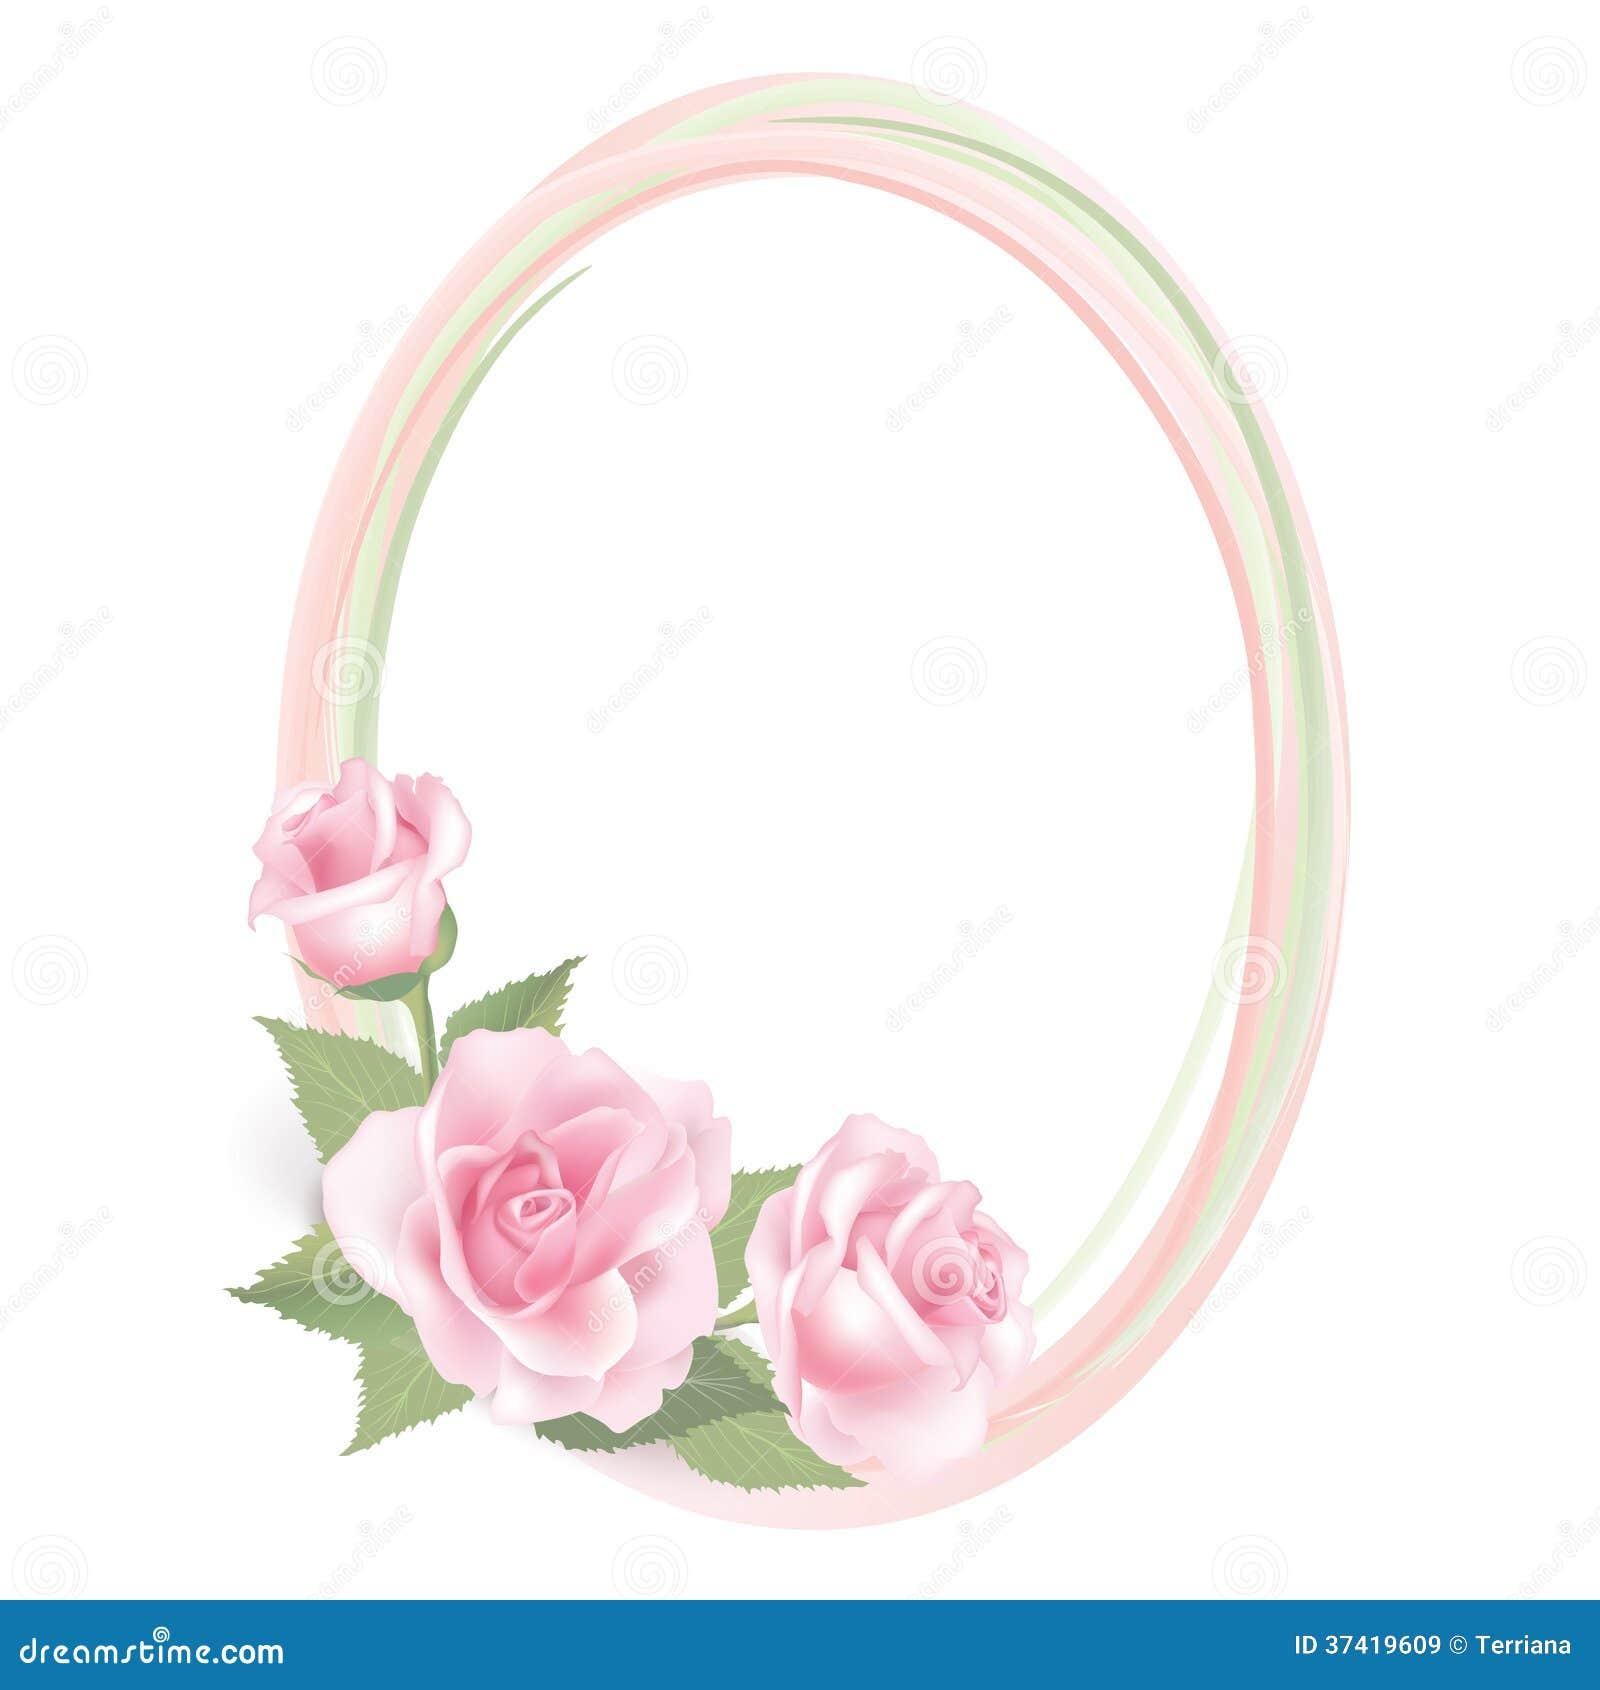 decoracao quadro branco:Flowers Pink Roses Frames